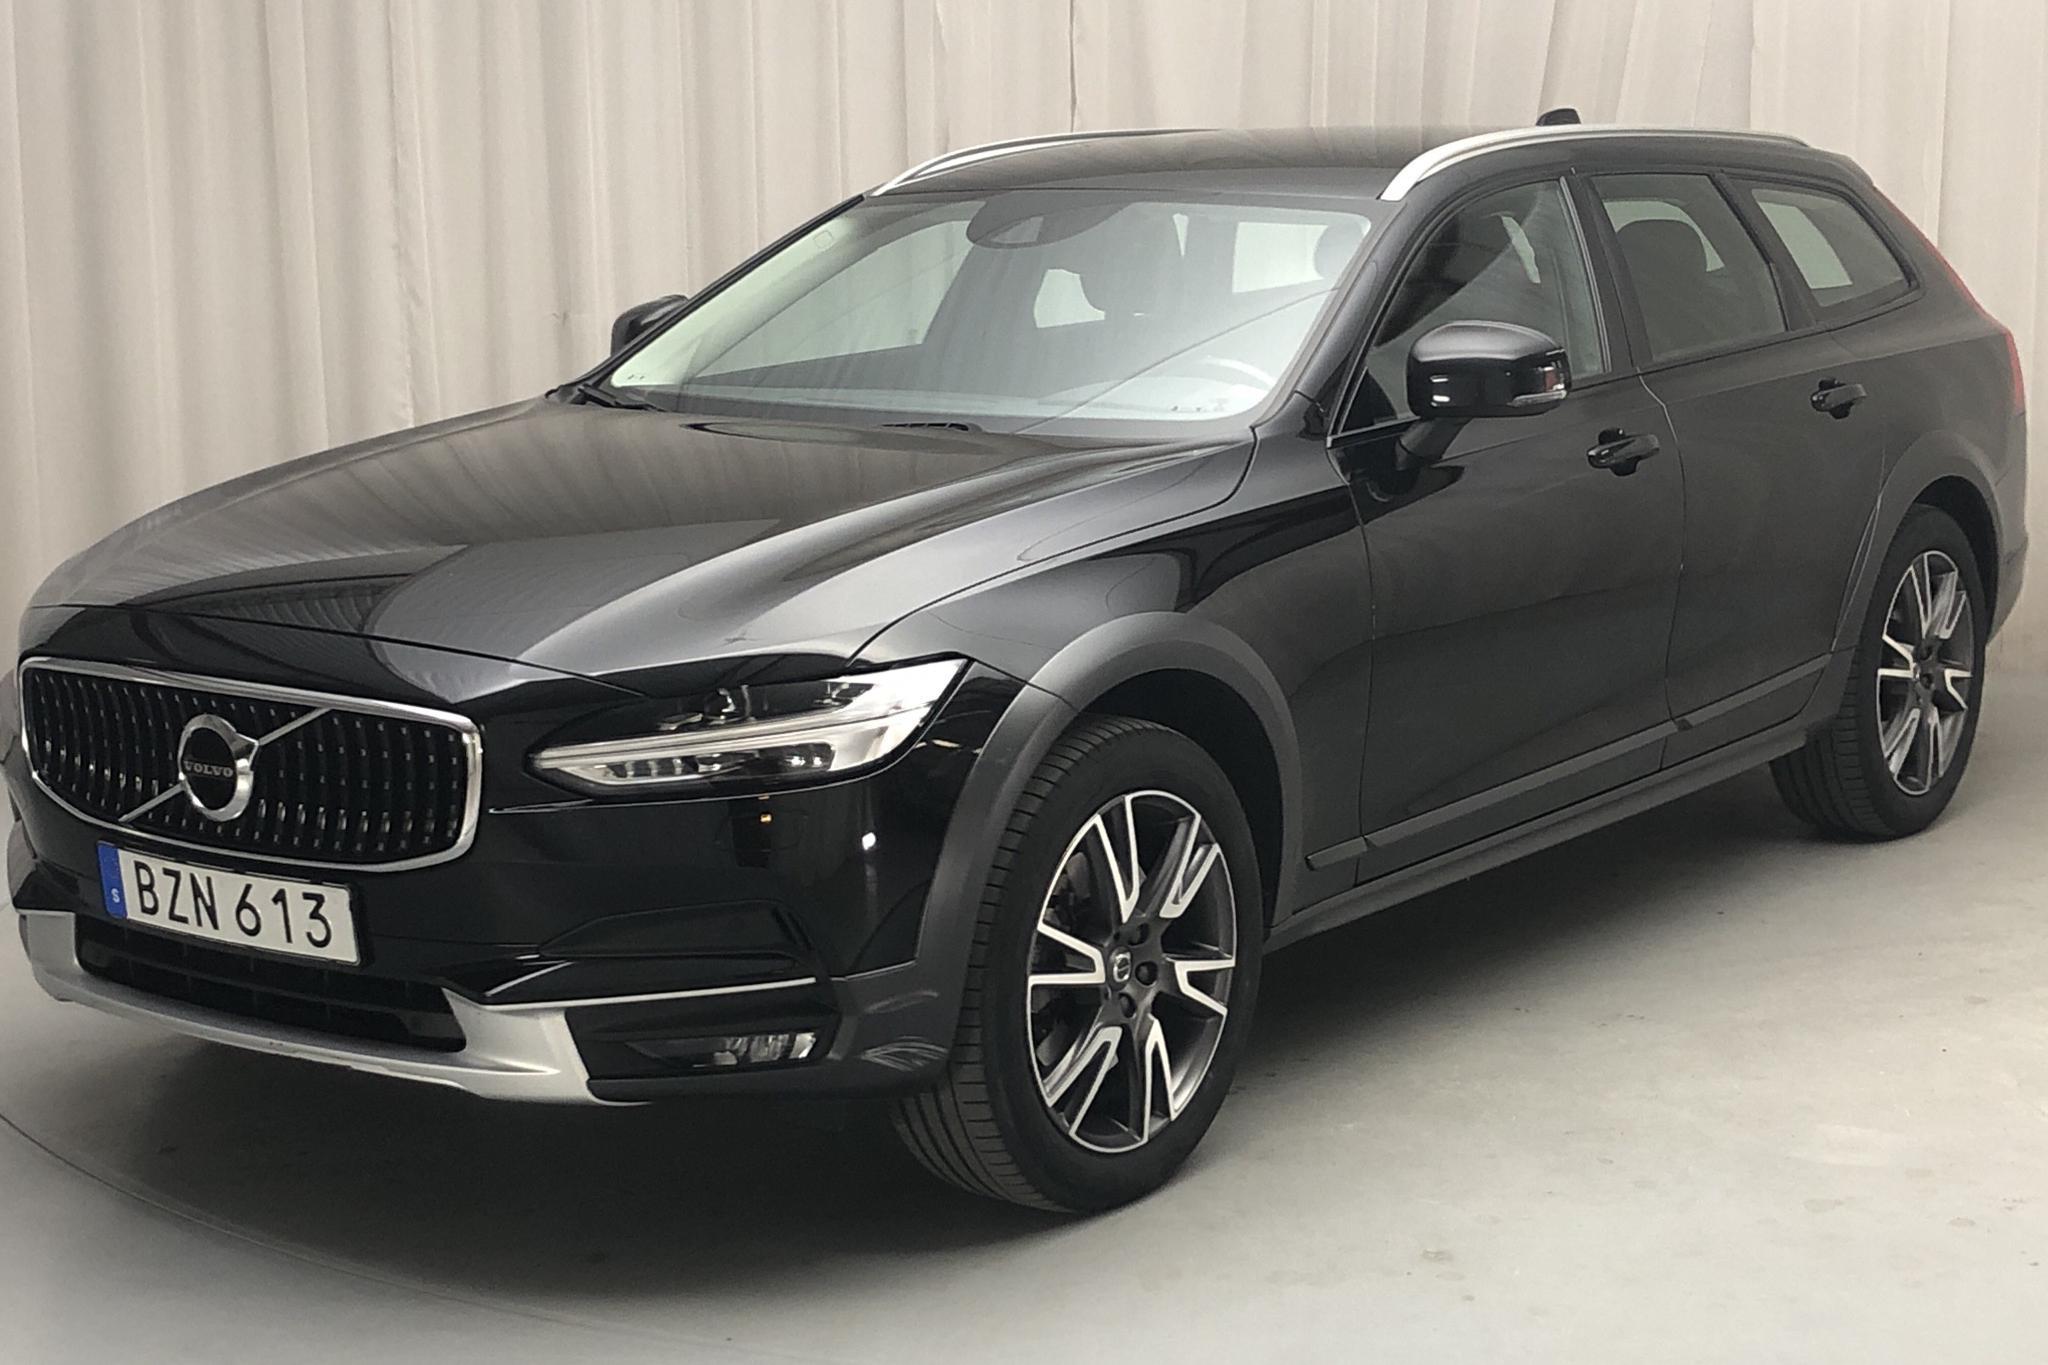 Volvo V90 D4 Cross Country AWD (190hk) - 10 567 mil - Automat - svart - 2018